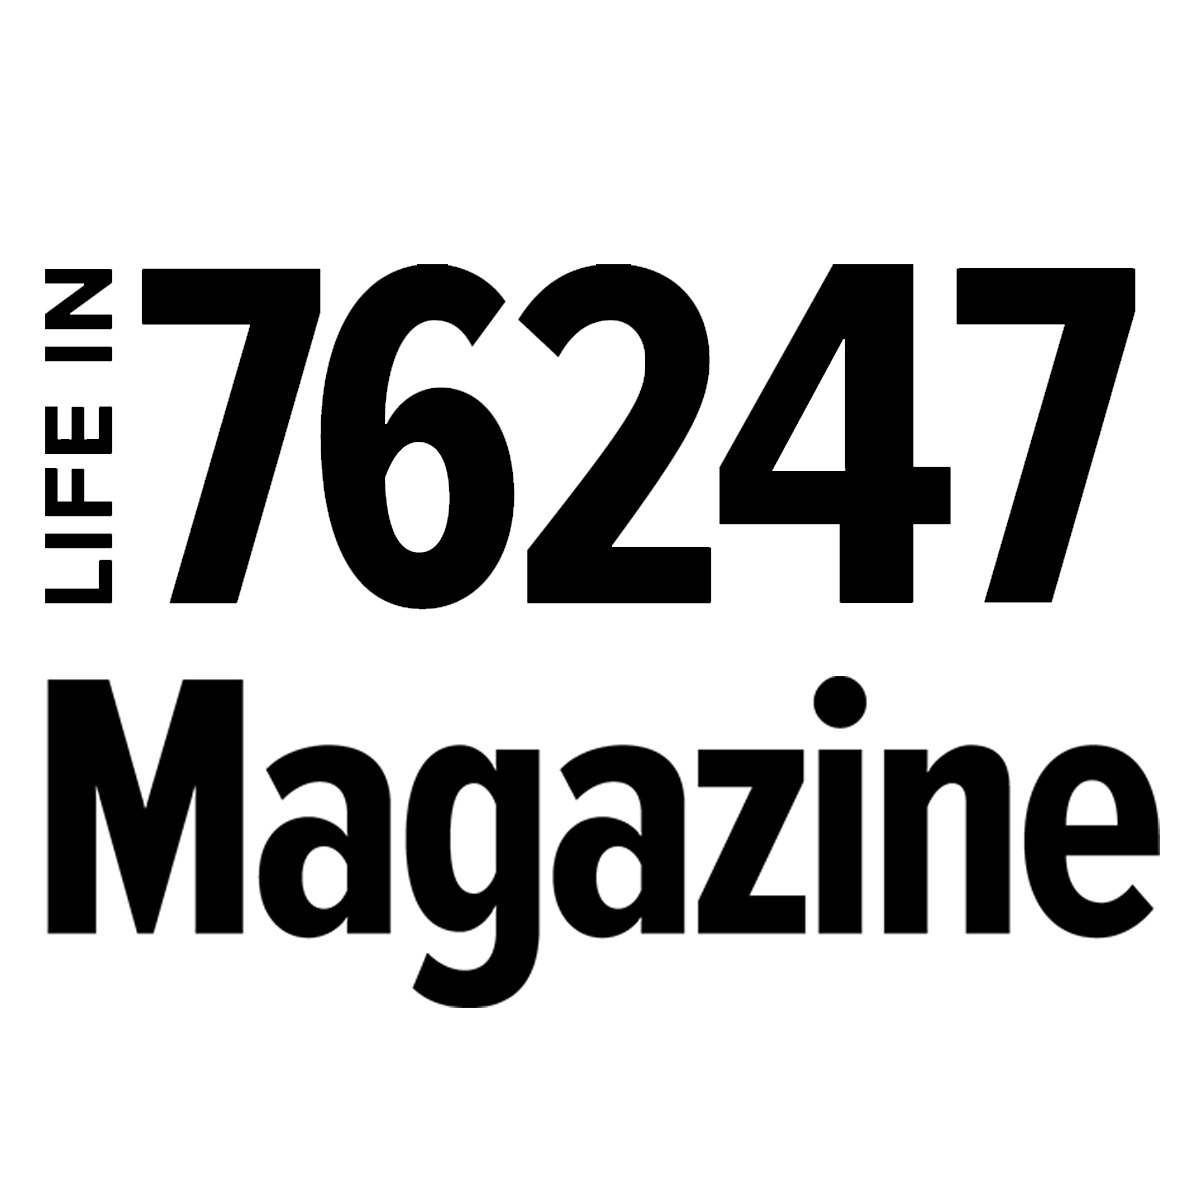 76247 Magazine